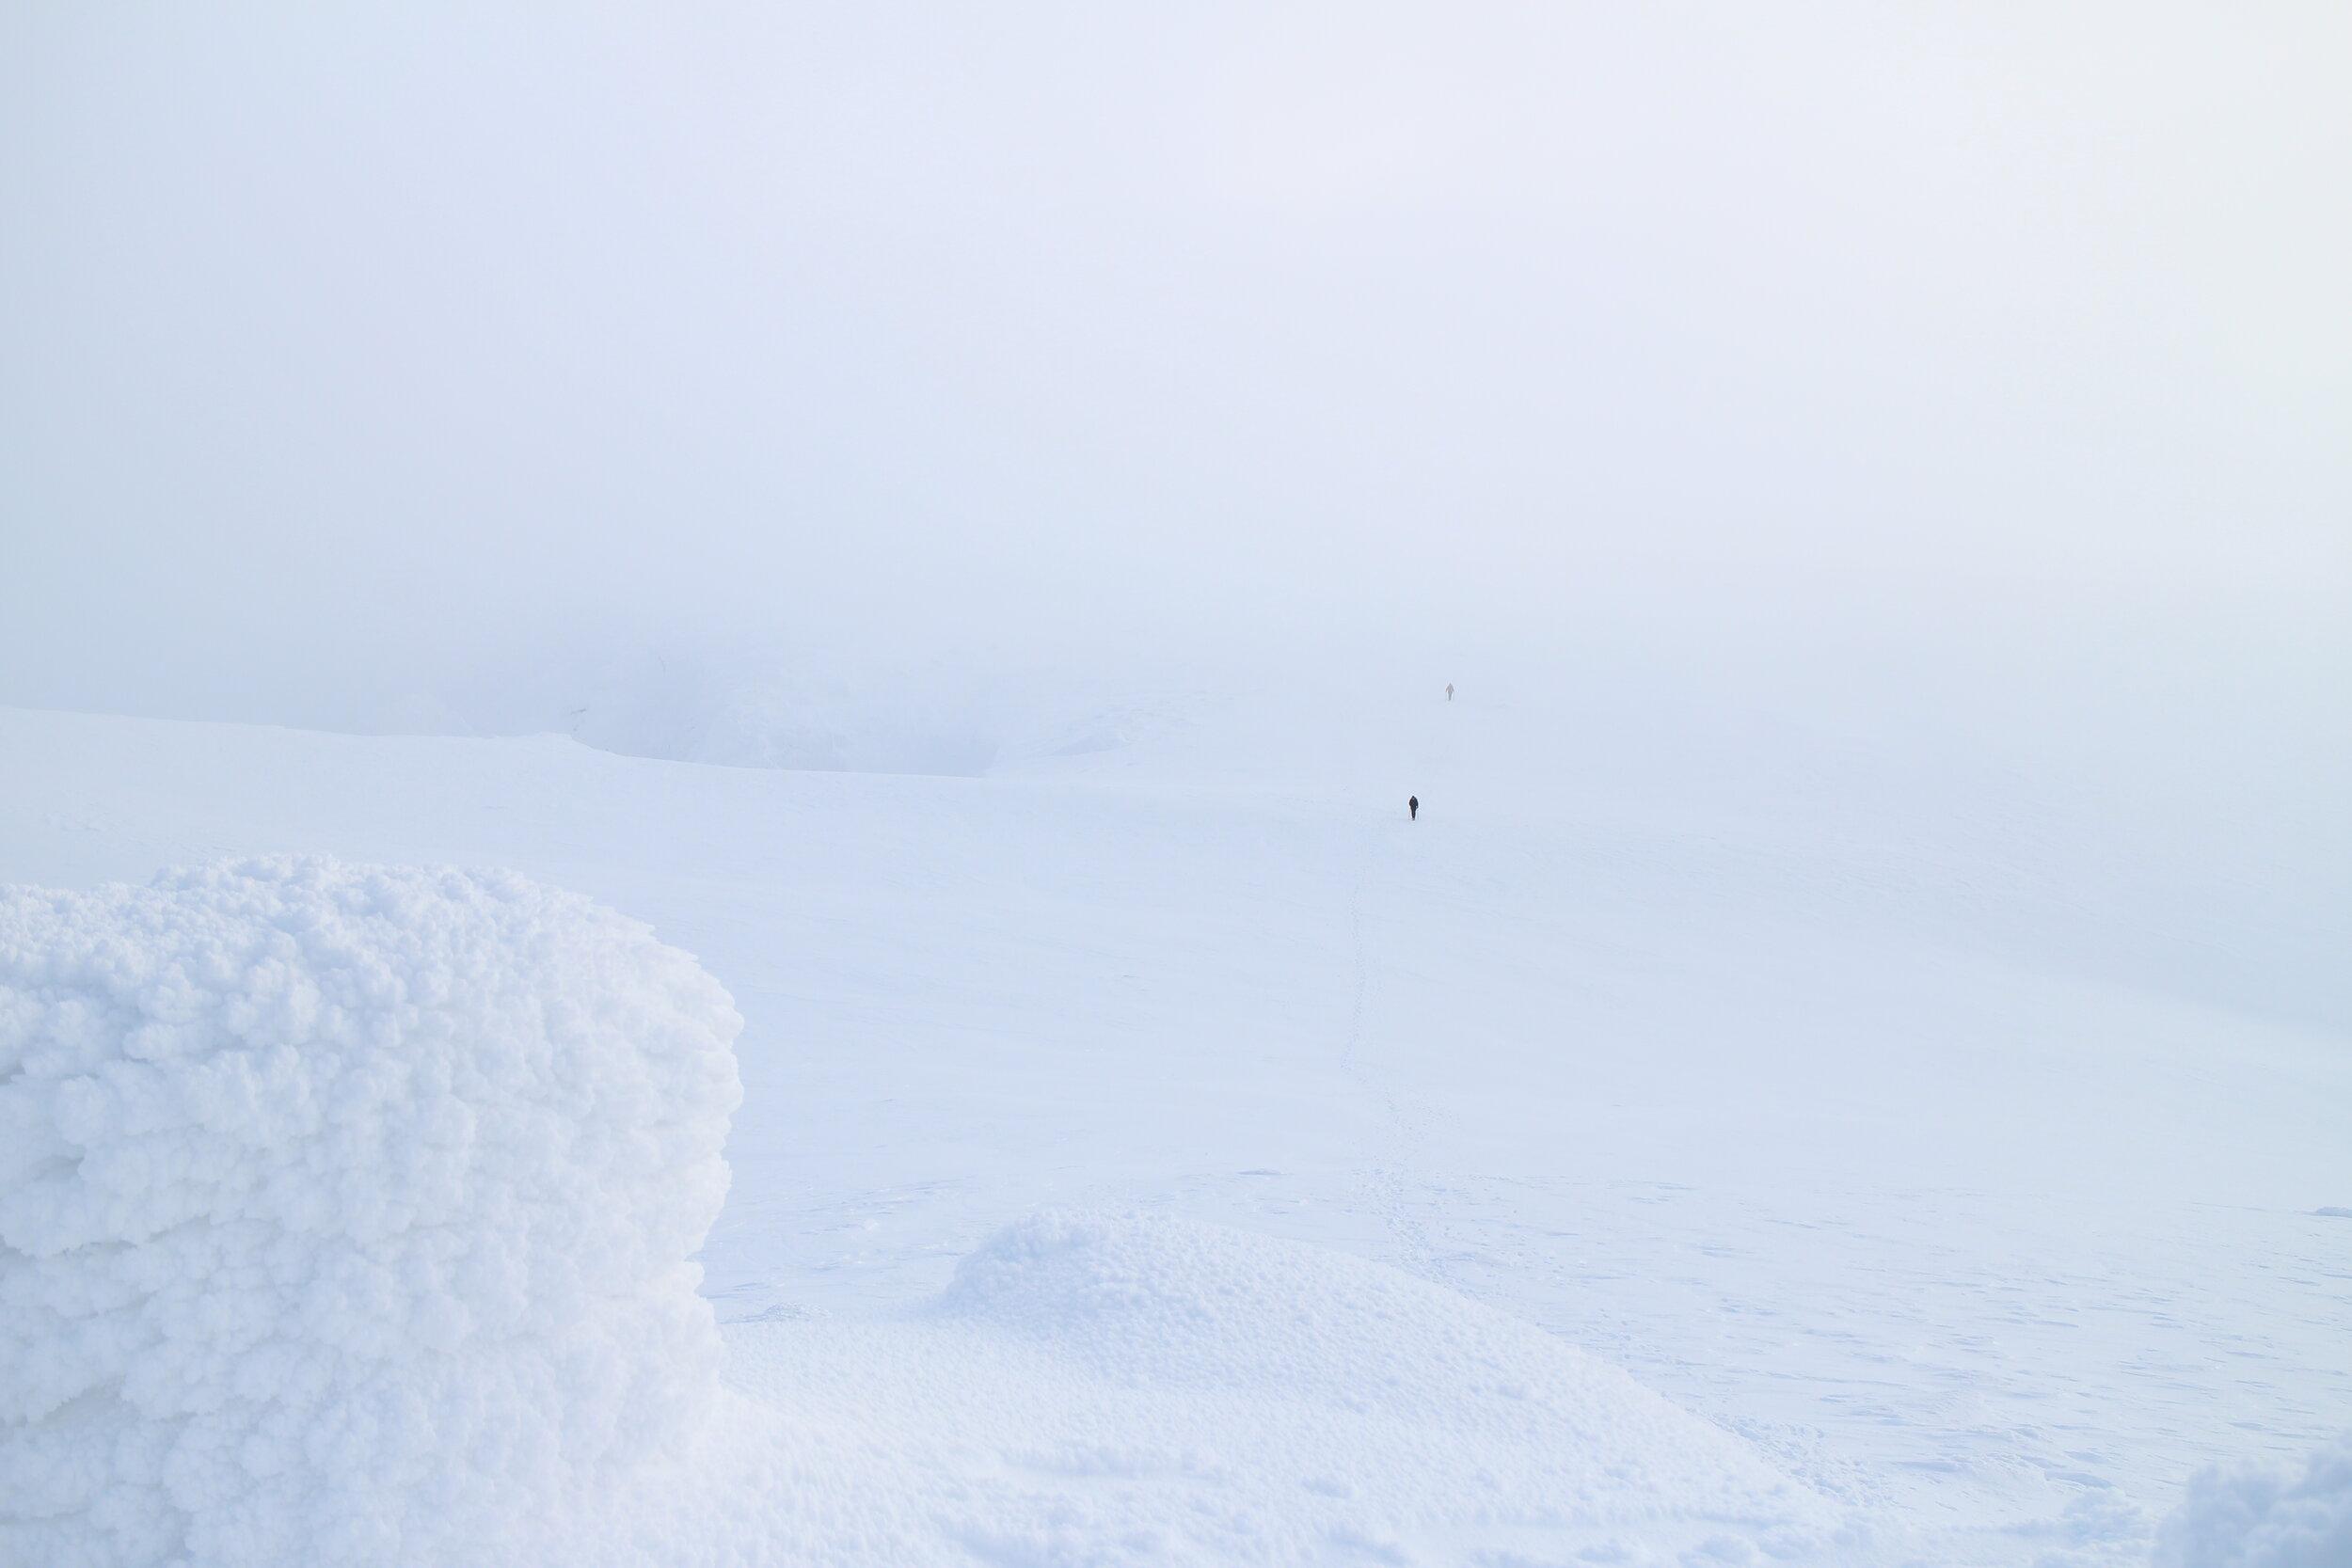 Approaching Lochnagar summit